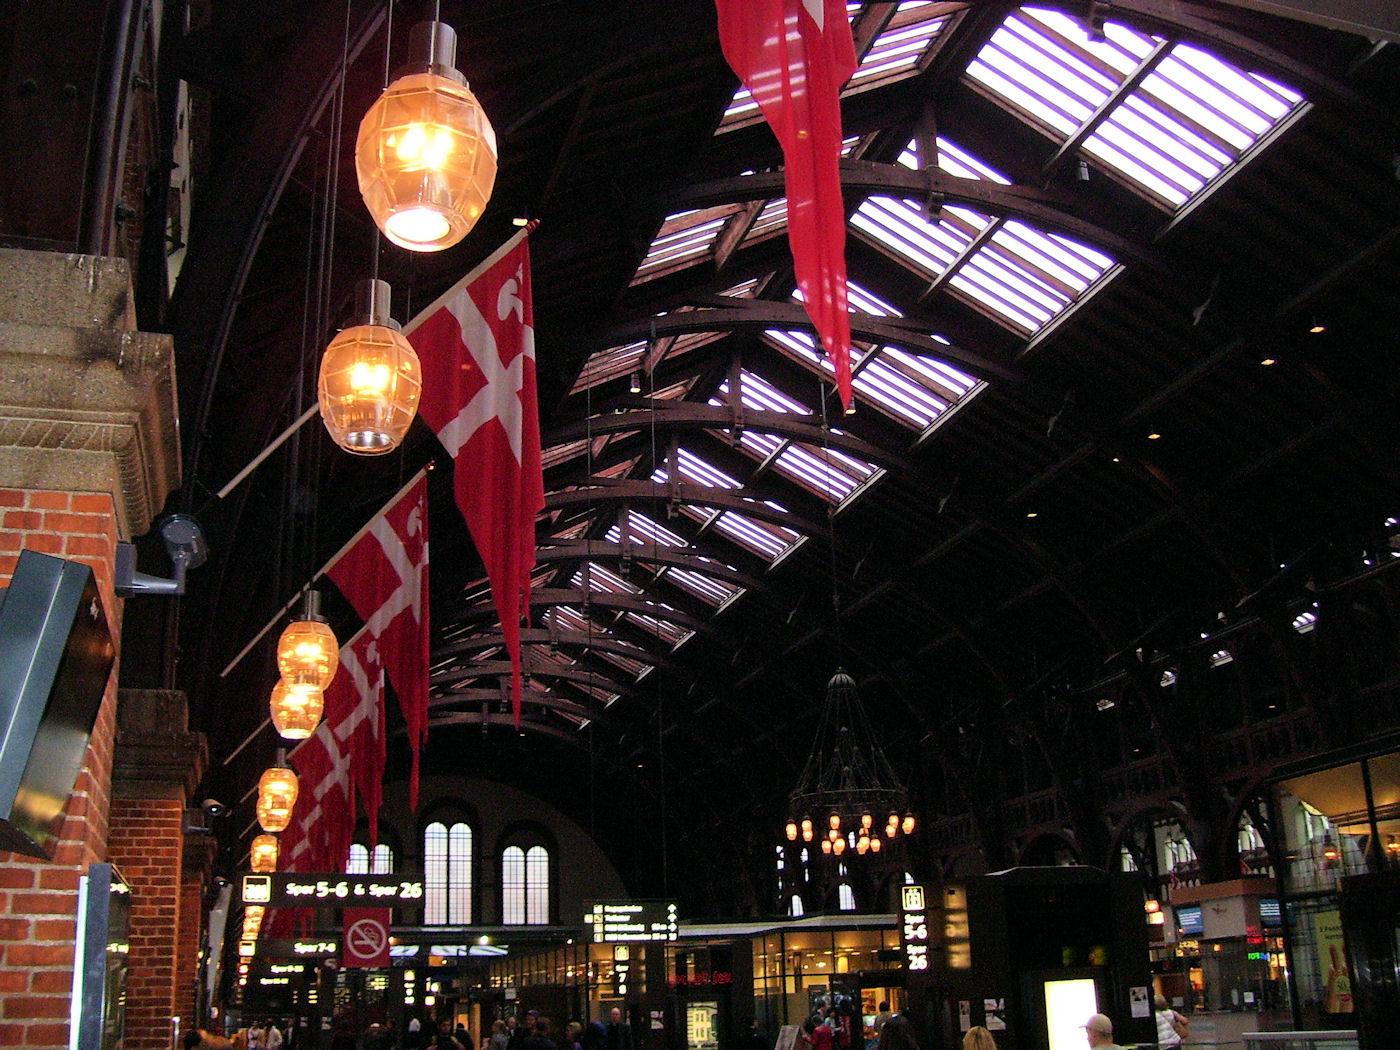 copenhagen train station interior